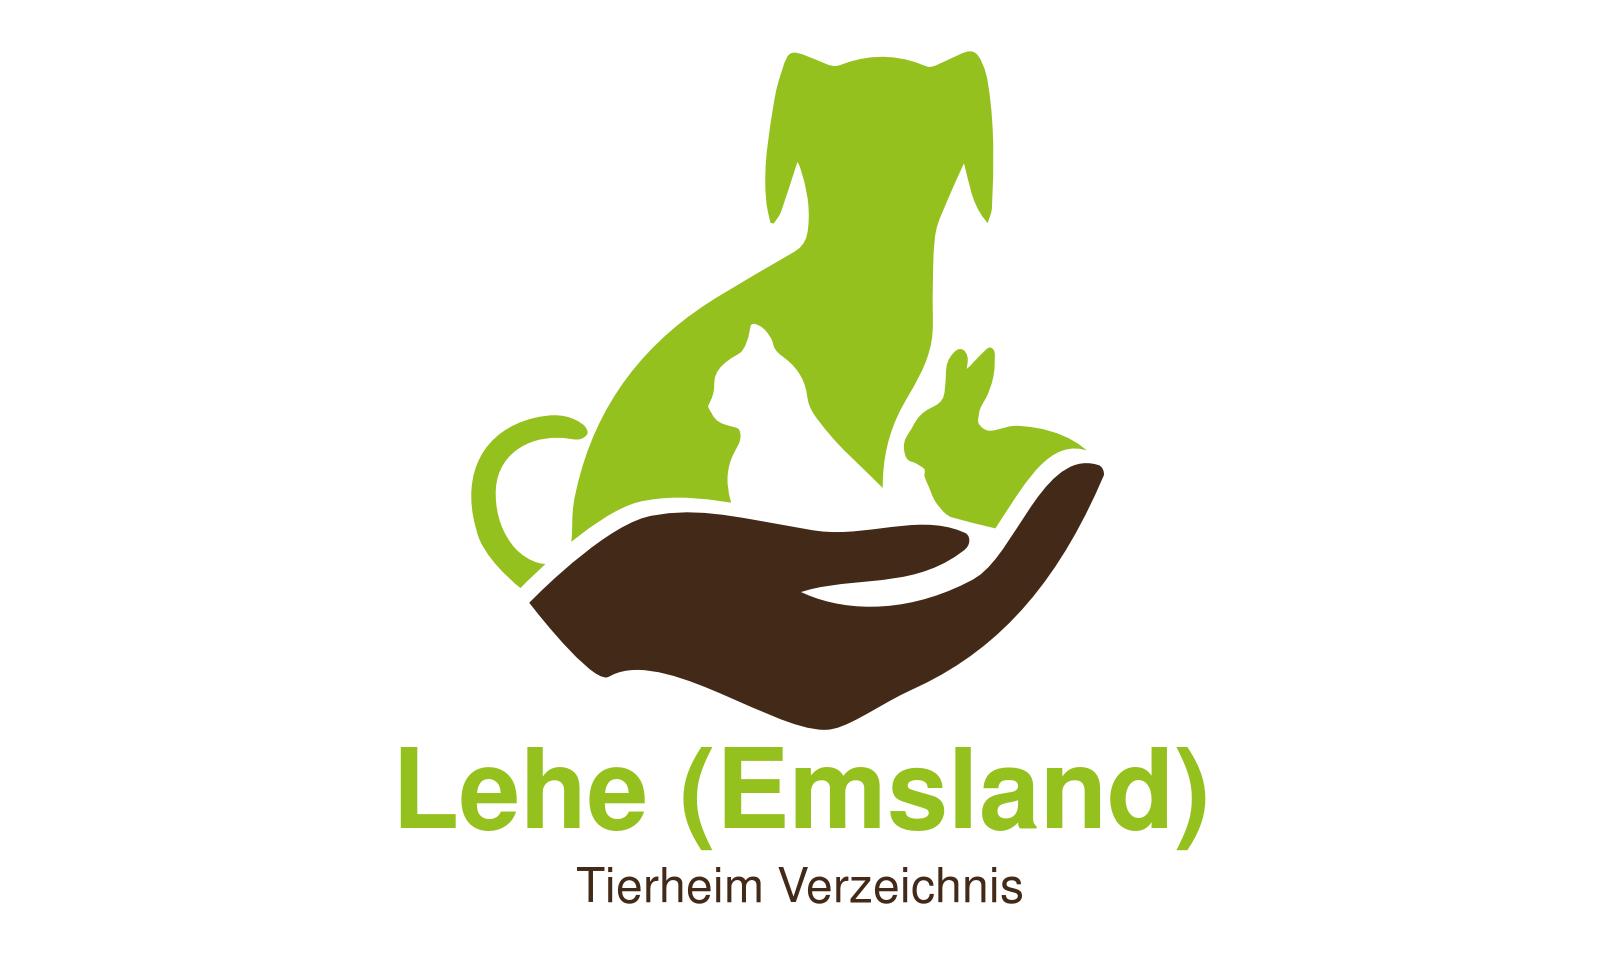 Tierheim Lehe (Emsland)